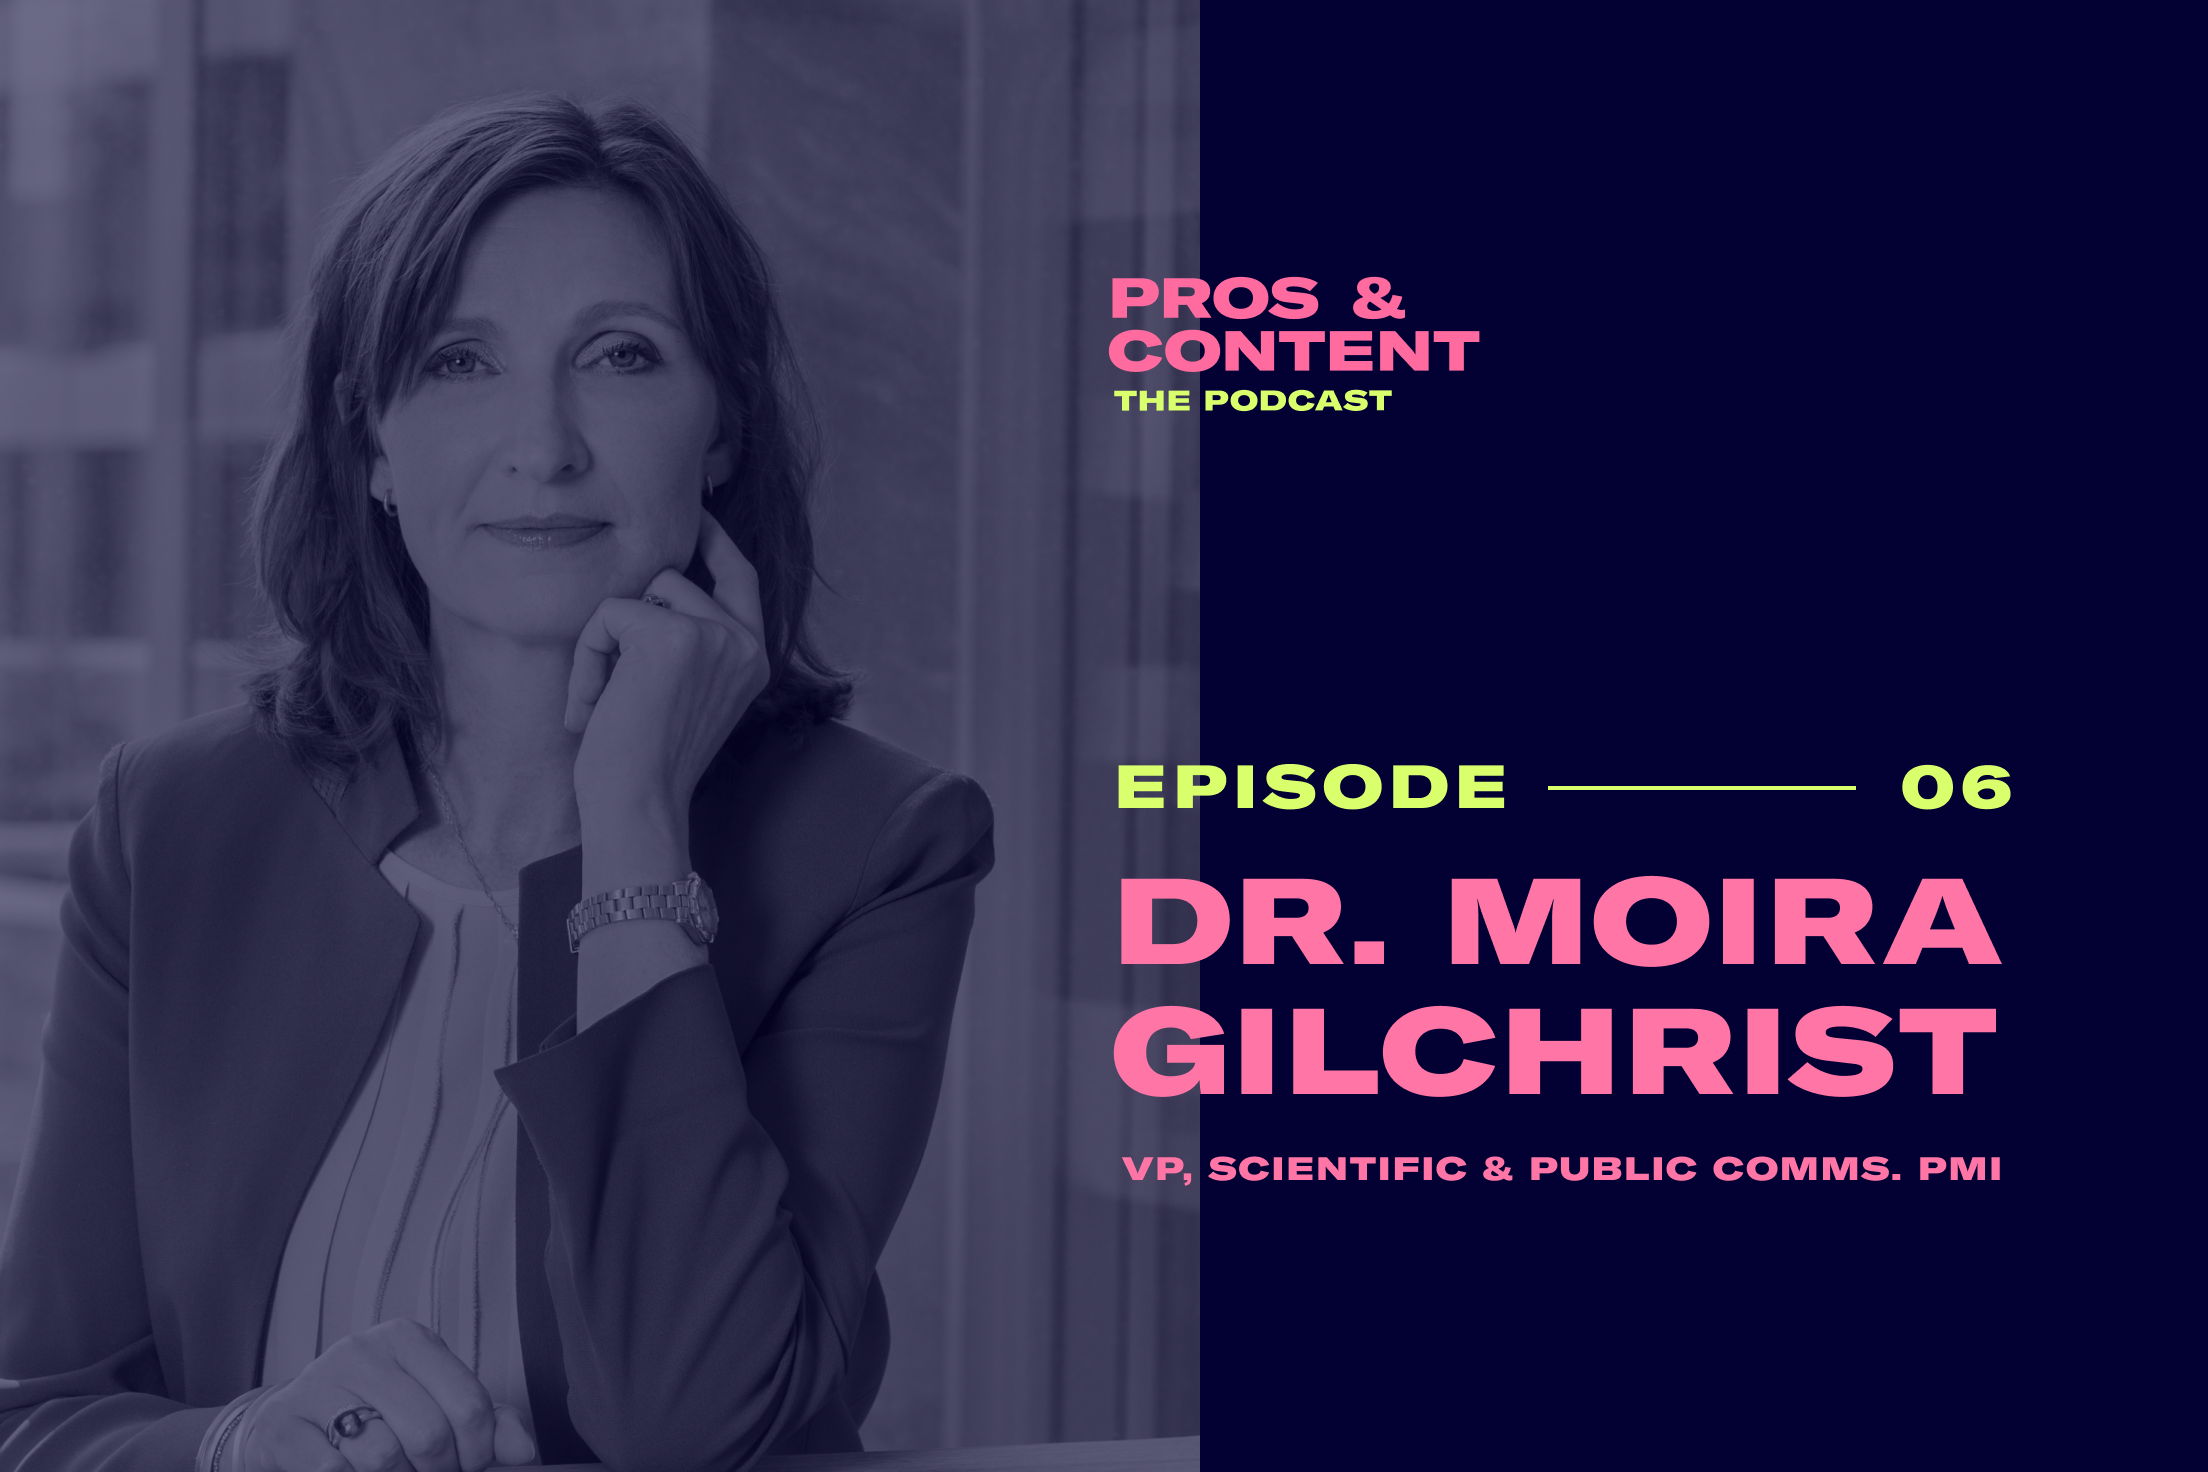 Pros & Content Podcast: Dr. Moira Gilchrist (VP Scientific & Public Comms at PMI)